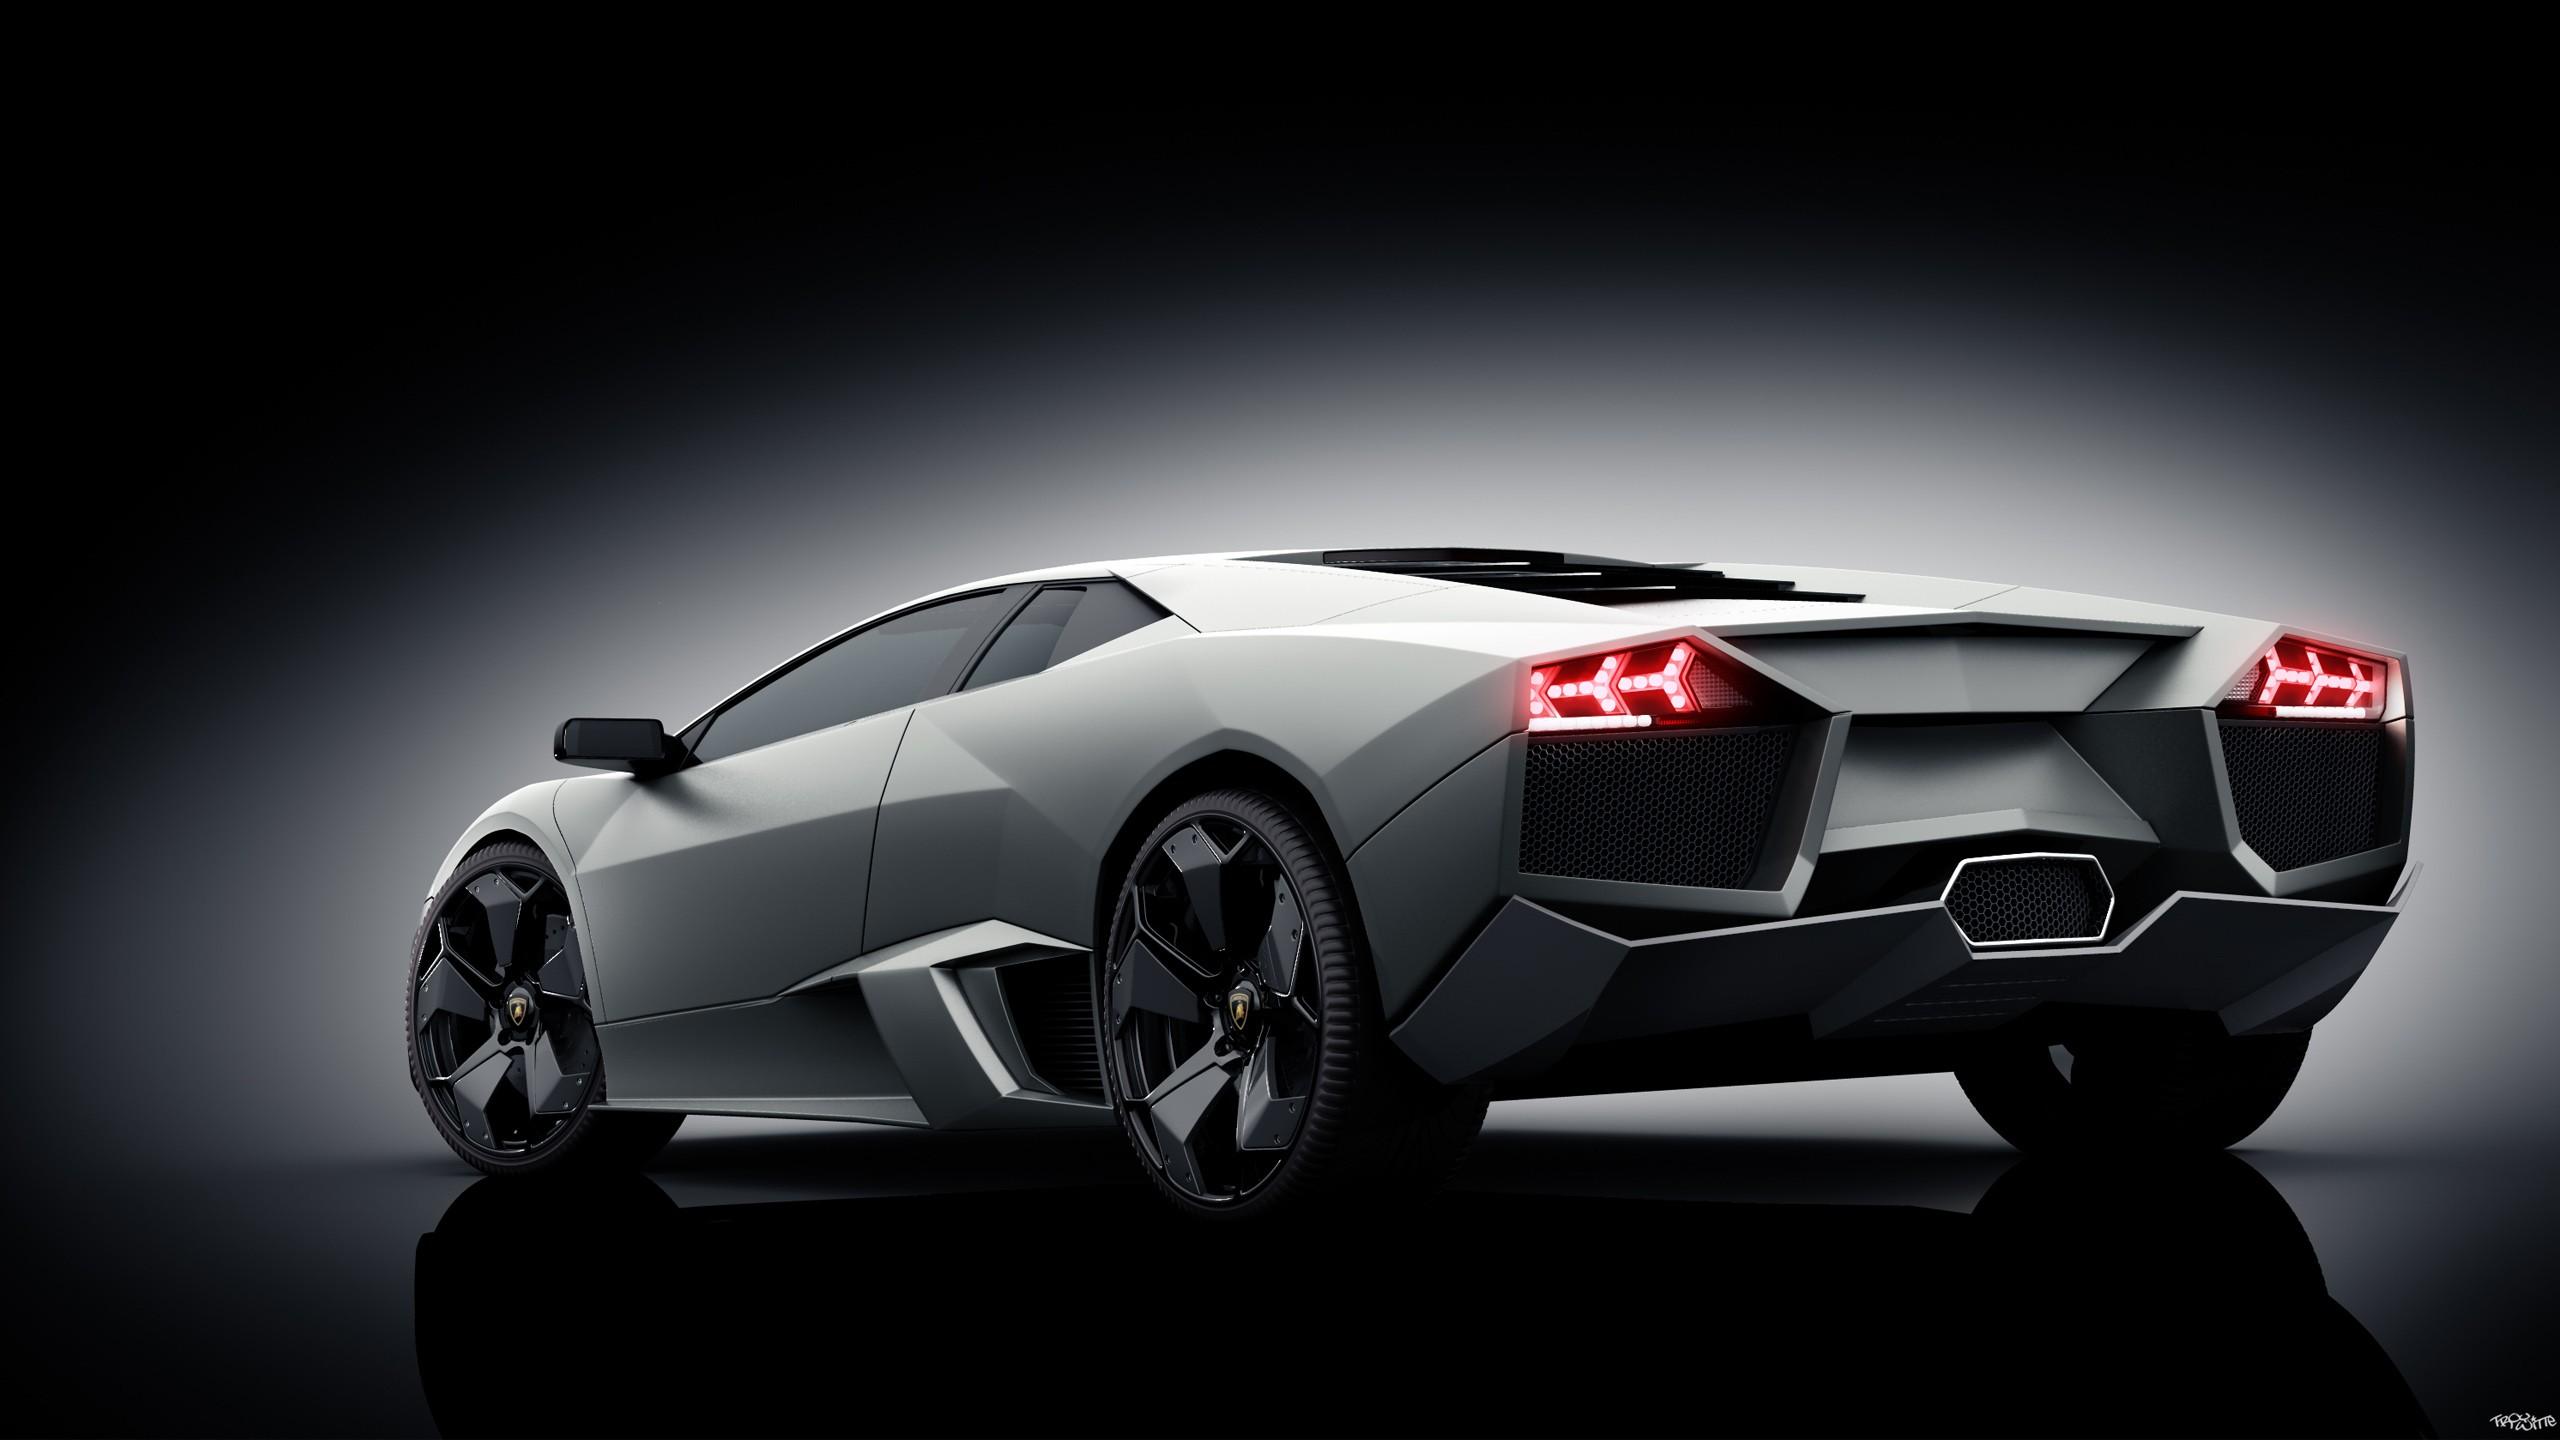 The lamborghini reventon concept 2 wallpaper hd car - Cars hd wallpapers for laptop ...